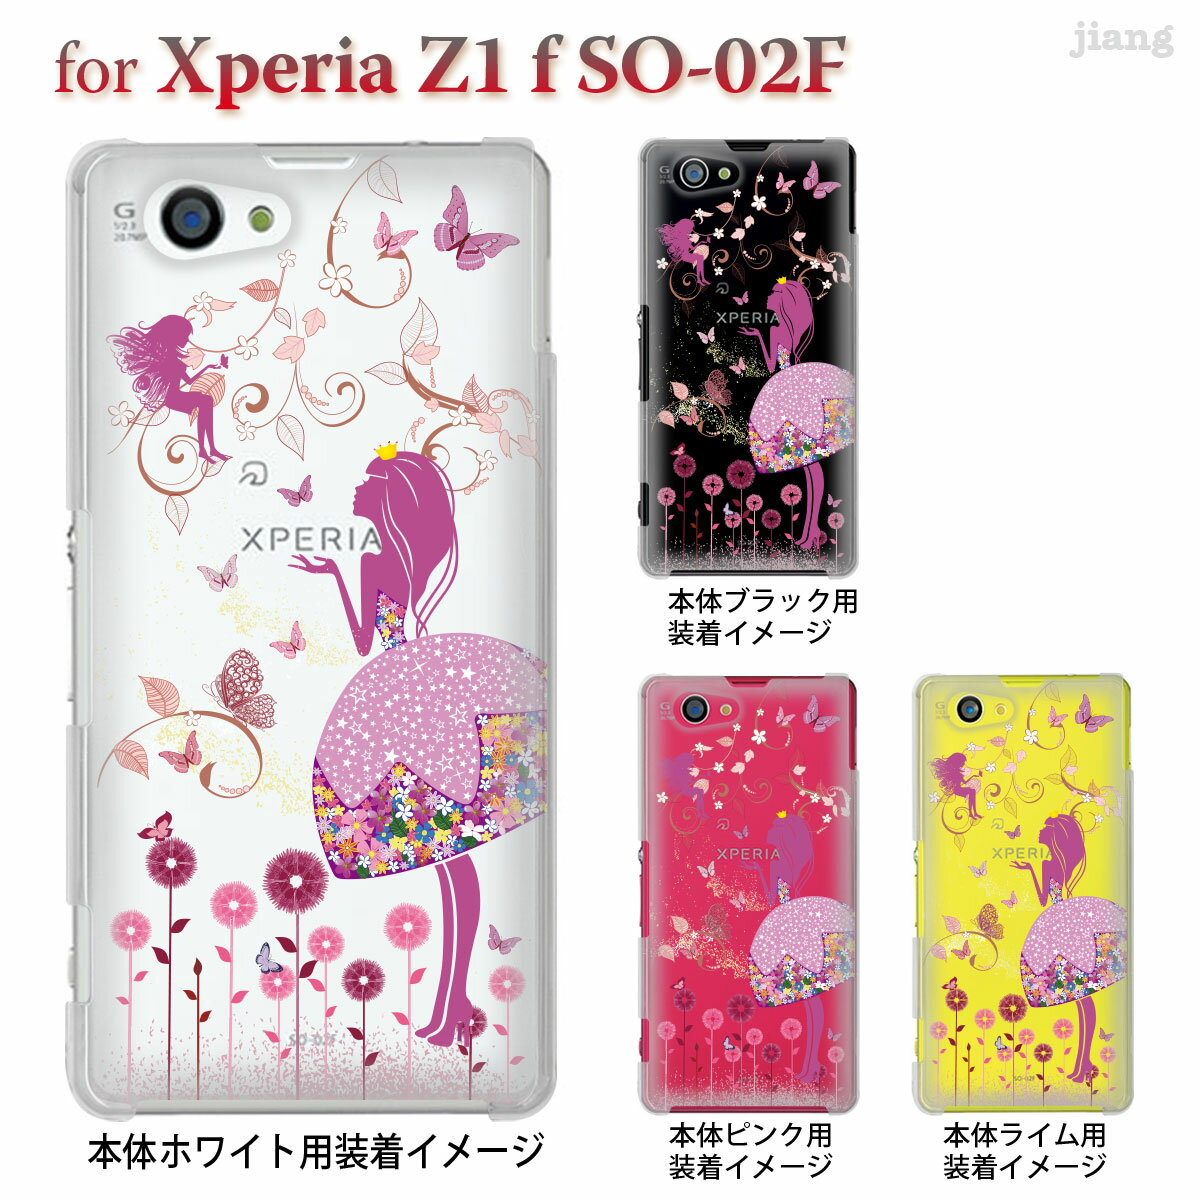 Xperia Z1 f SO-02F so02f ケース カバー スマホケース クリアケース jiang ジアン Clear Arts プリンセスとエンジェル 01-so02f-ca0145